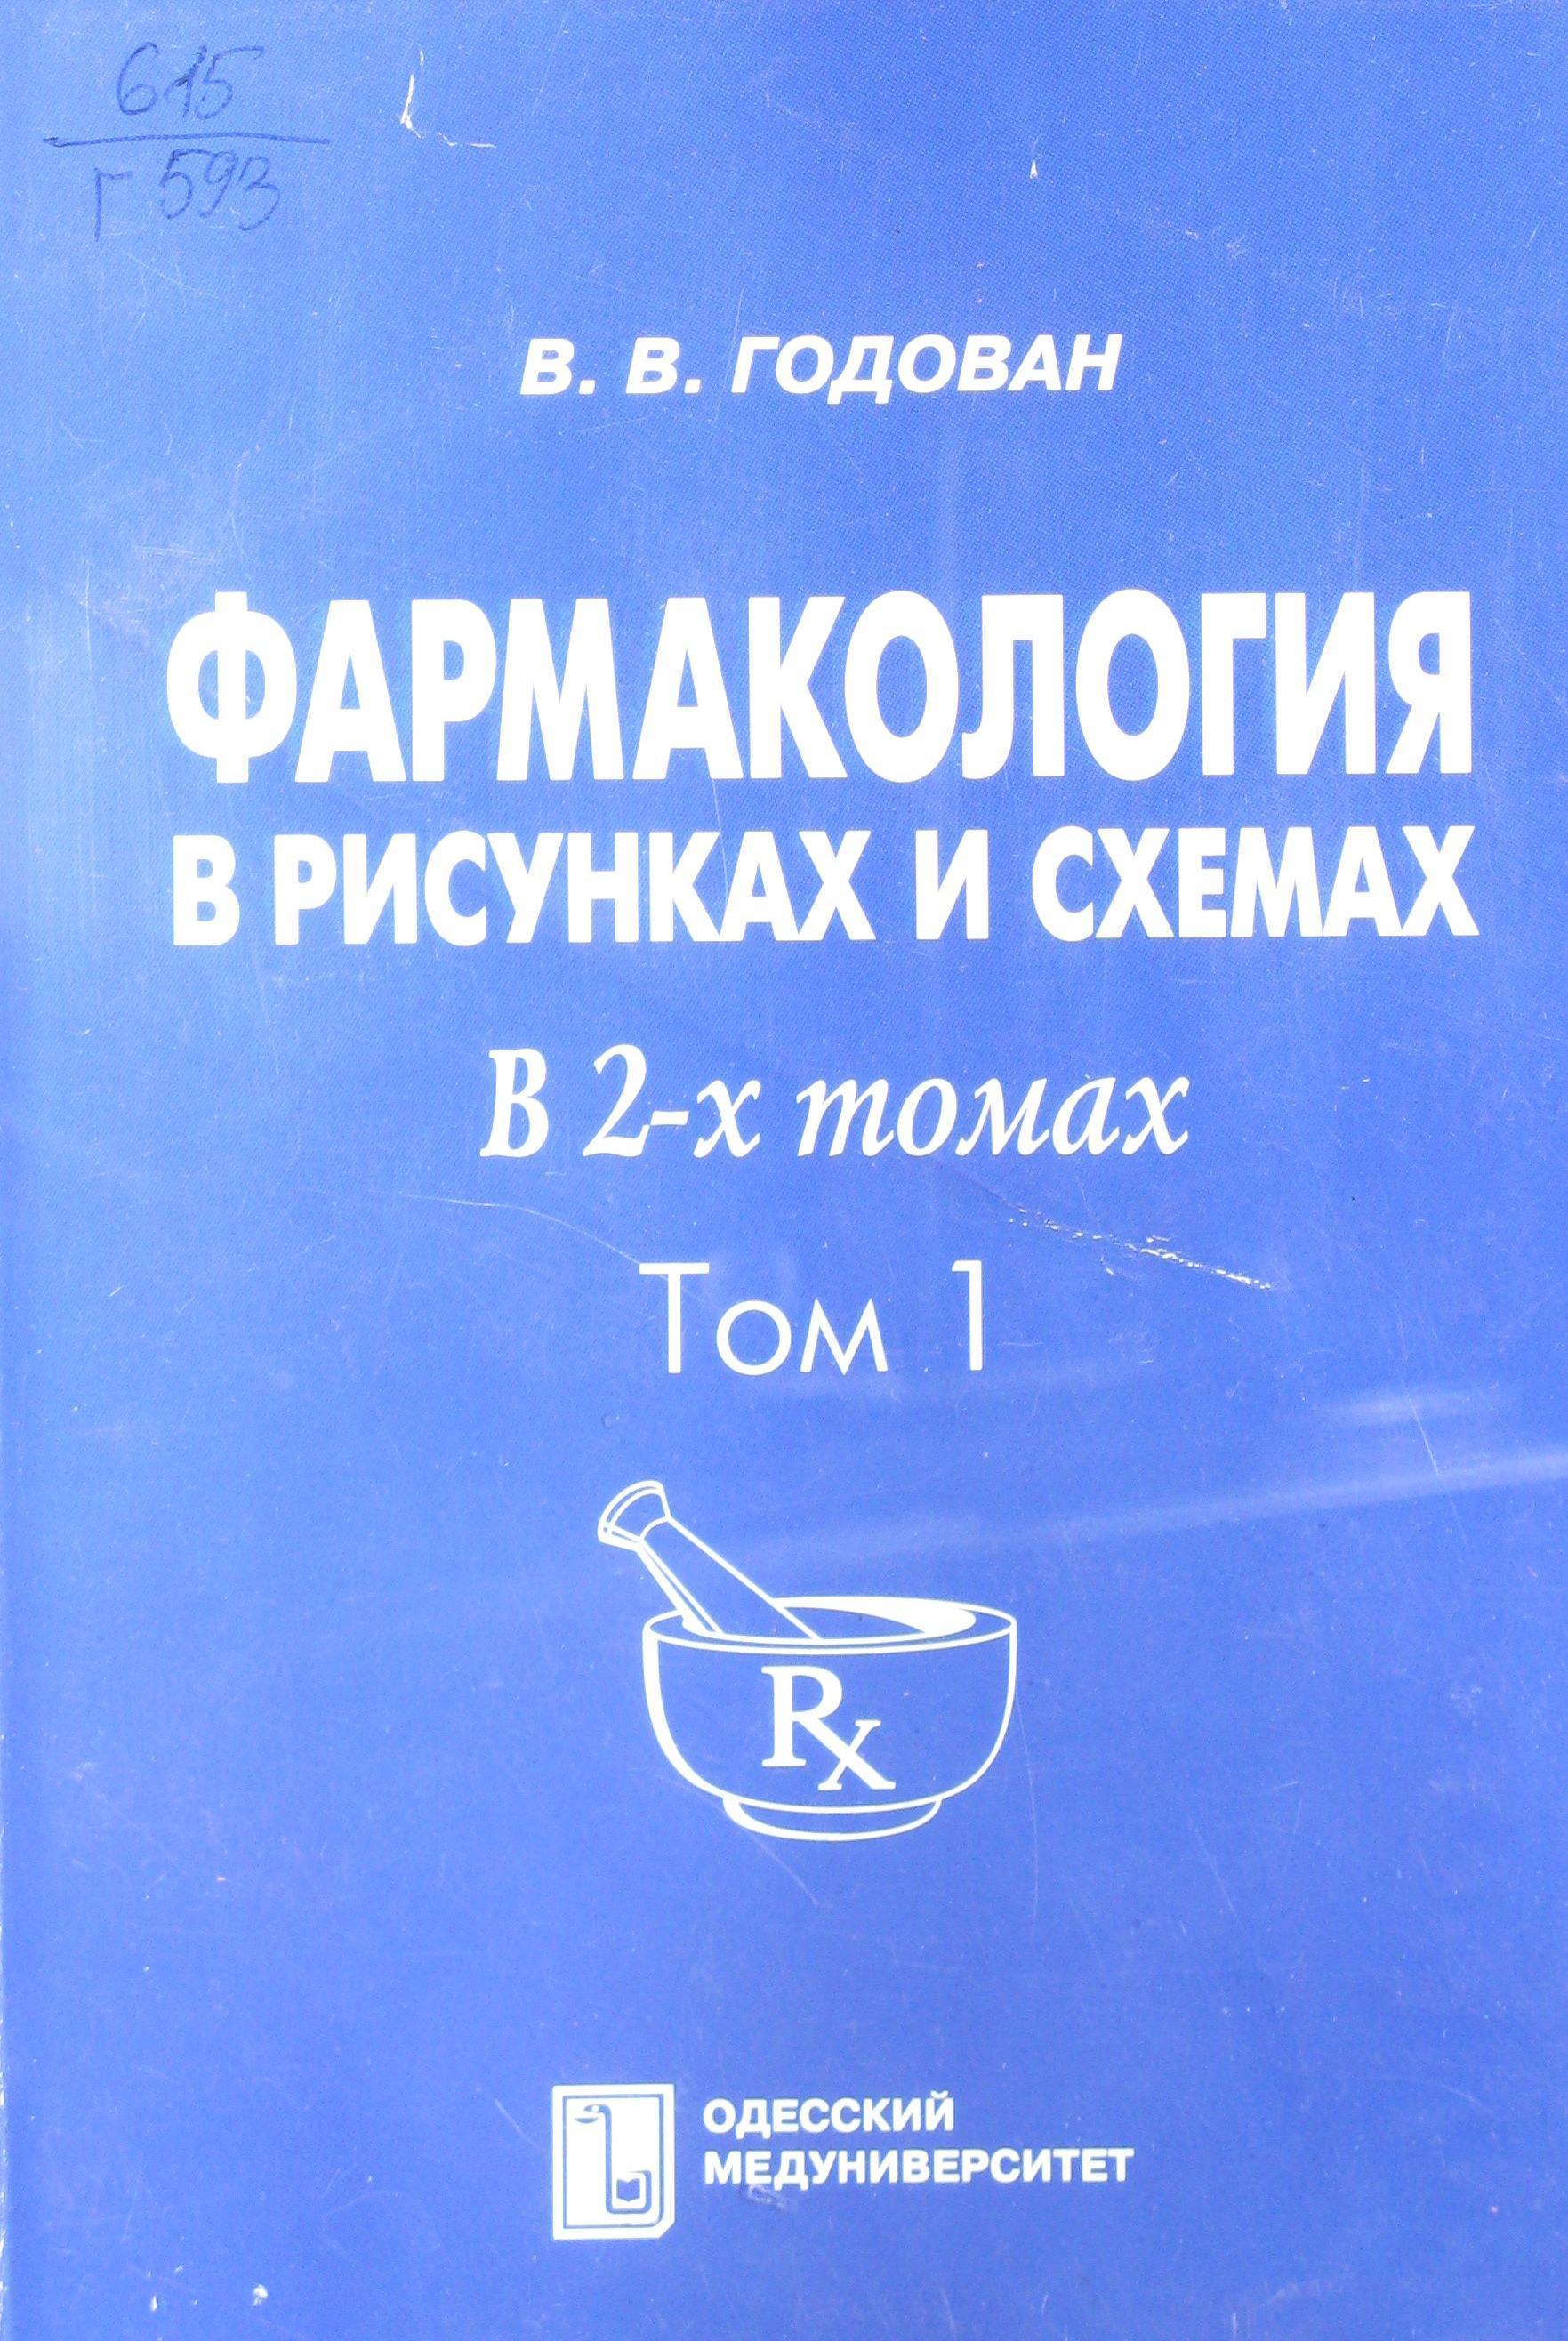 Годован фармакология в схемах и таблицах фото 704